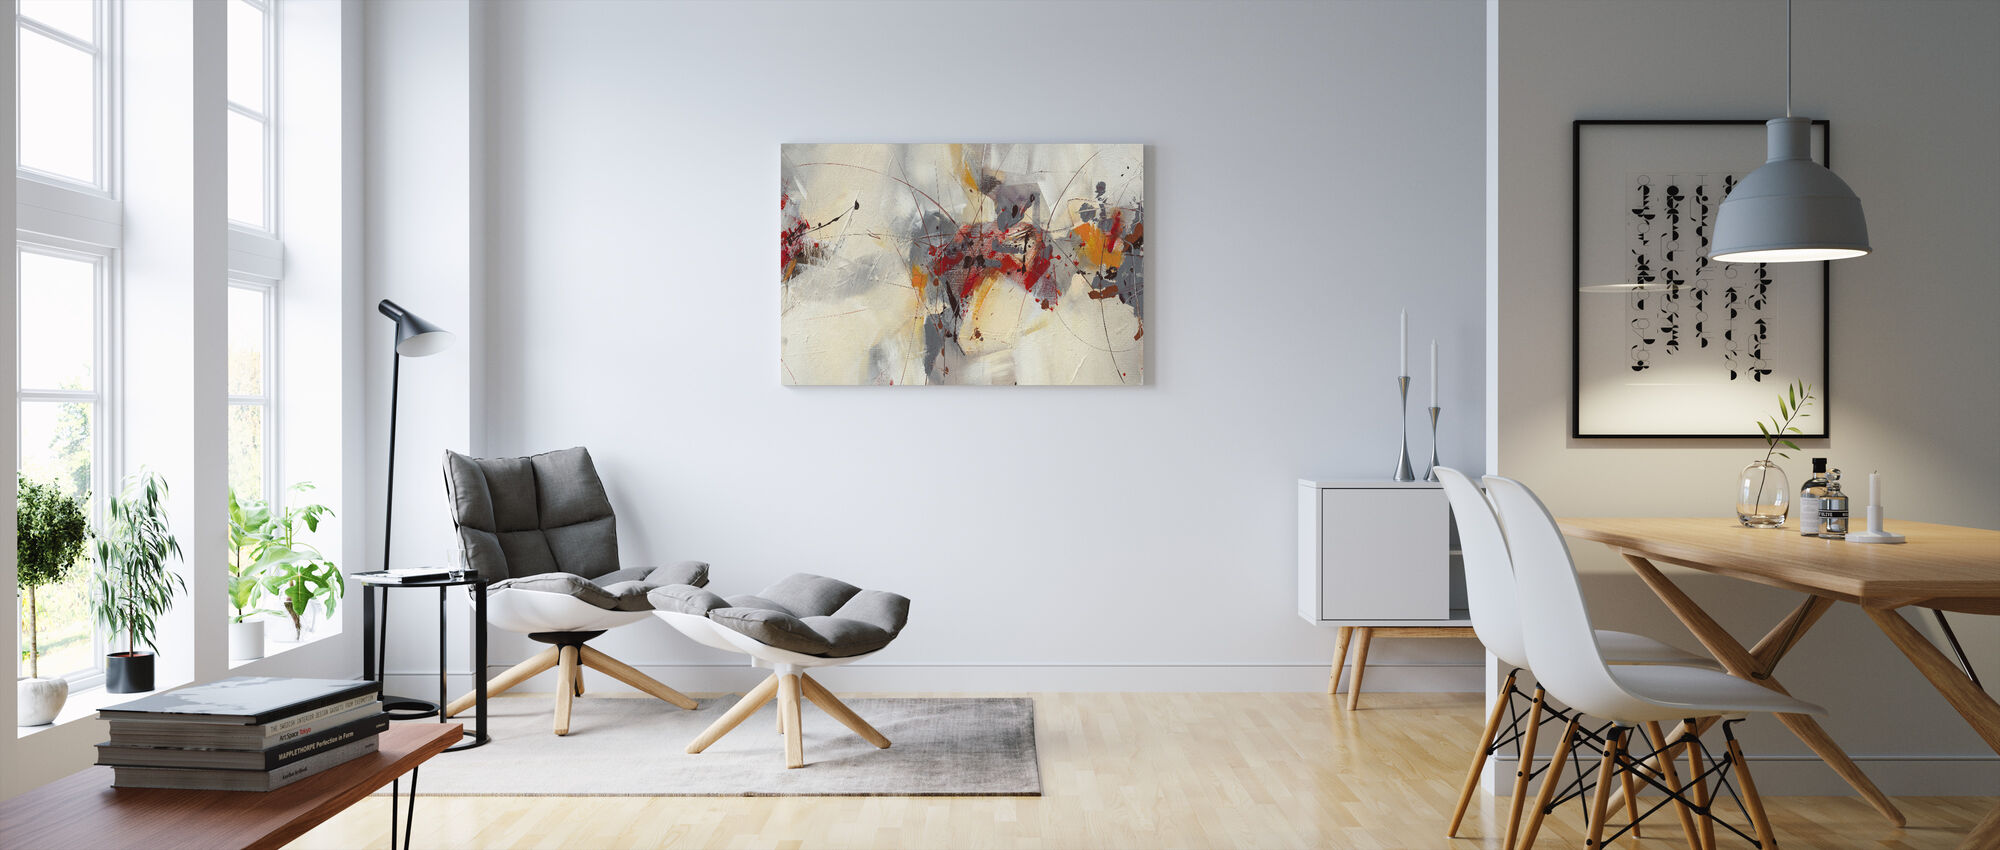 Slagverk - Canvastavla - Vardagsrum